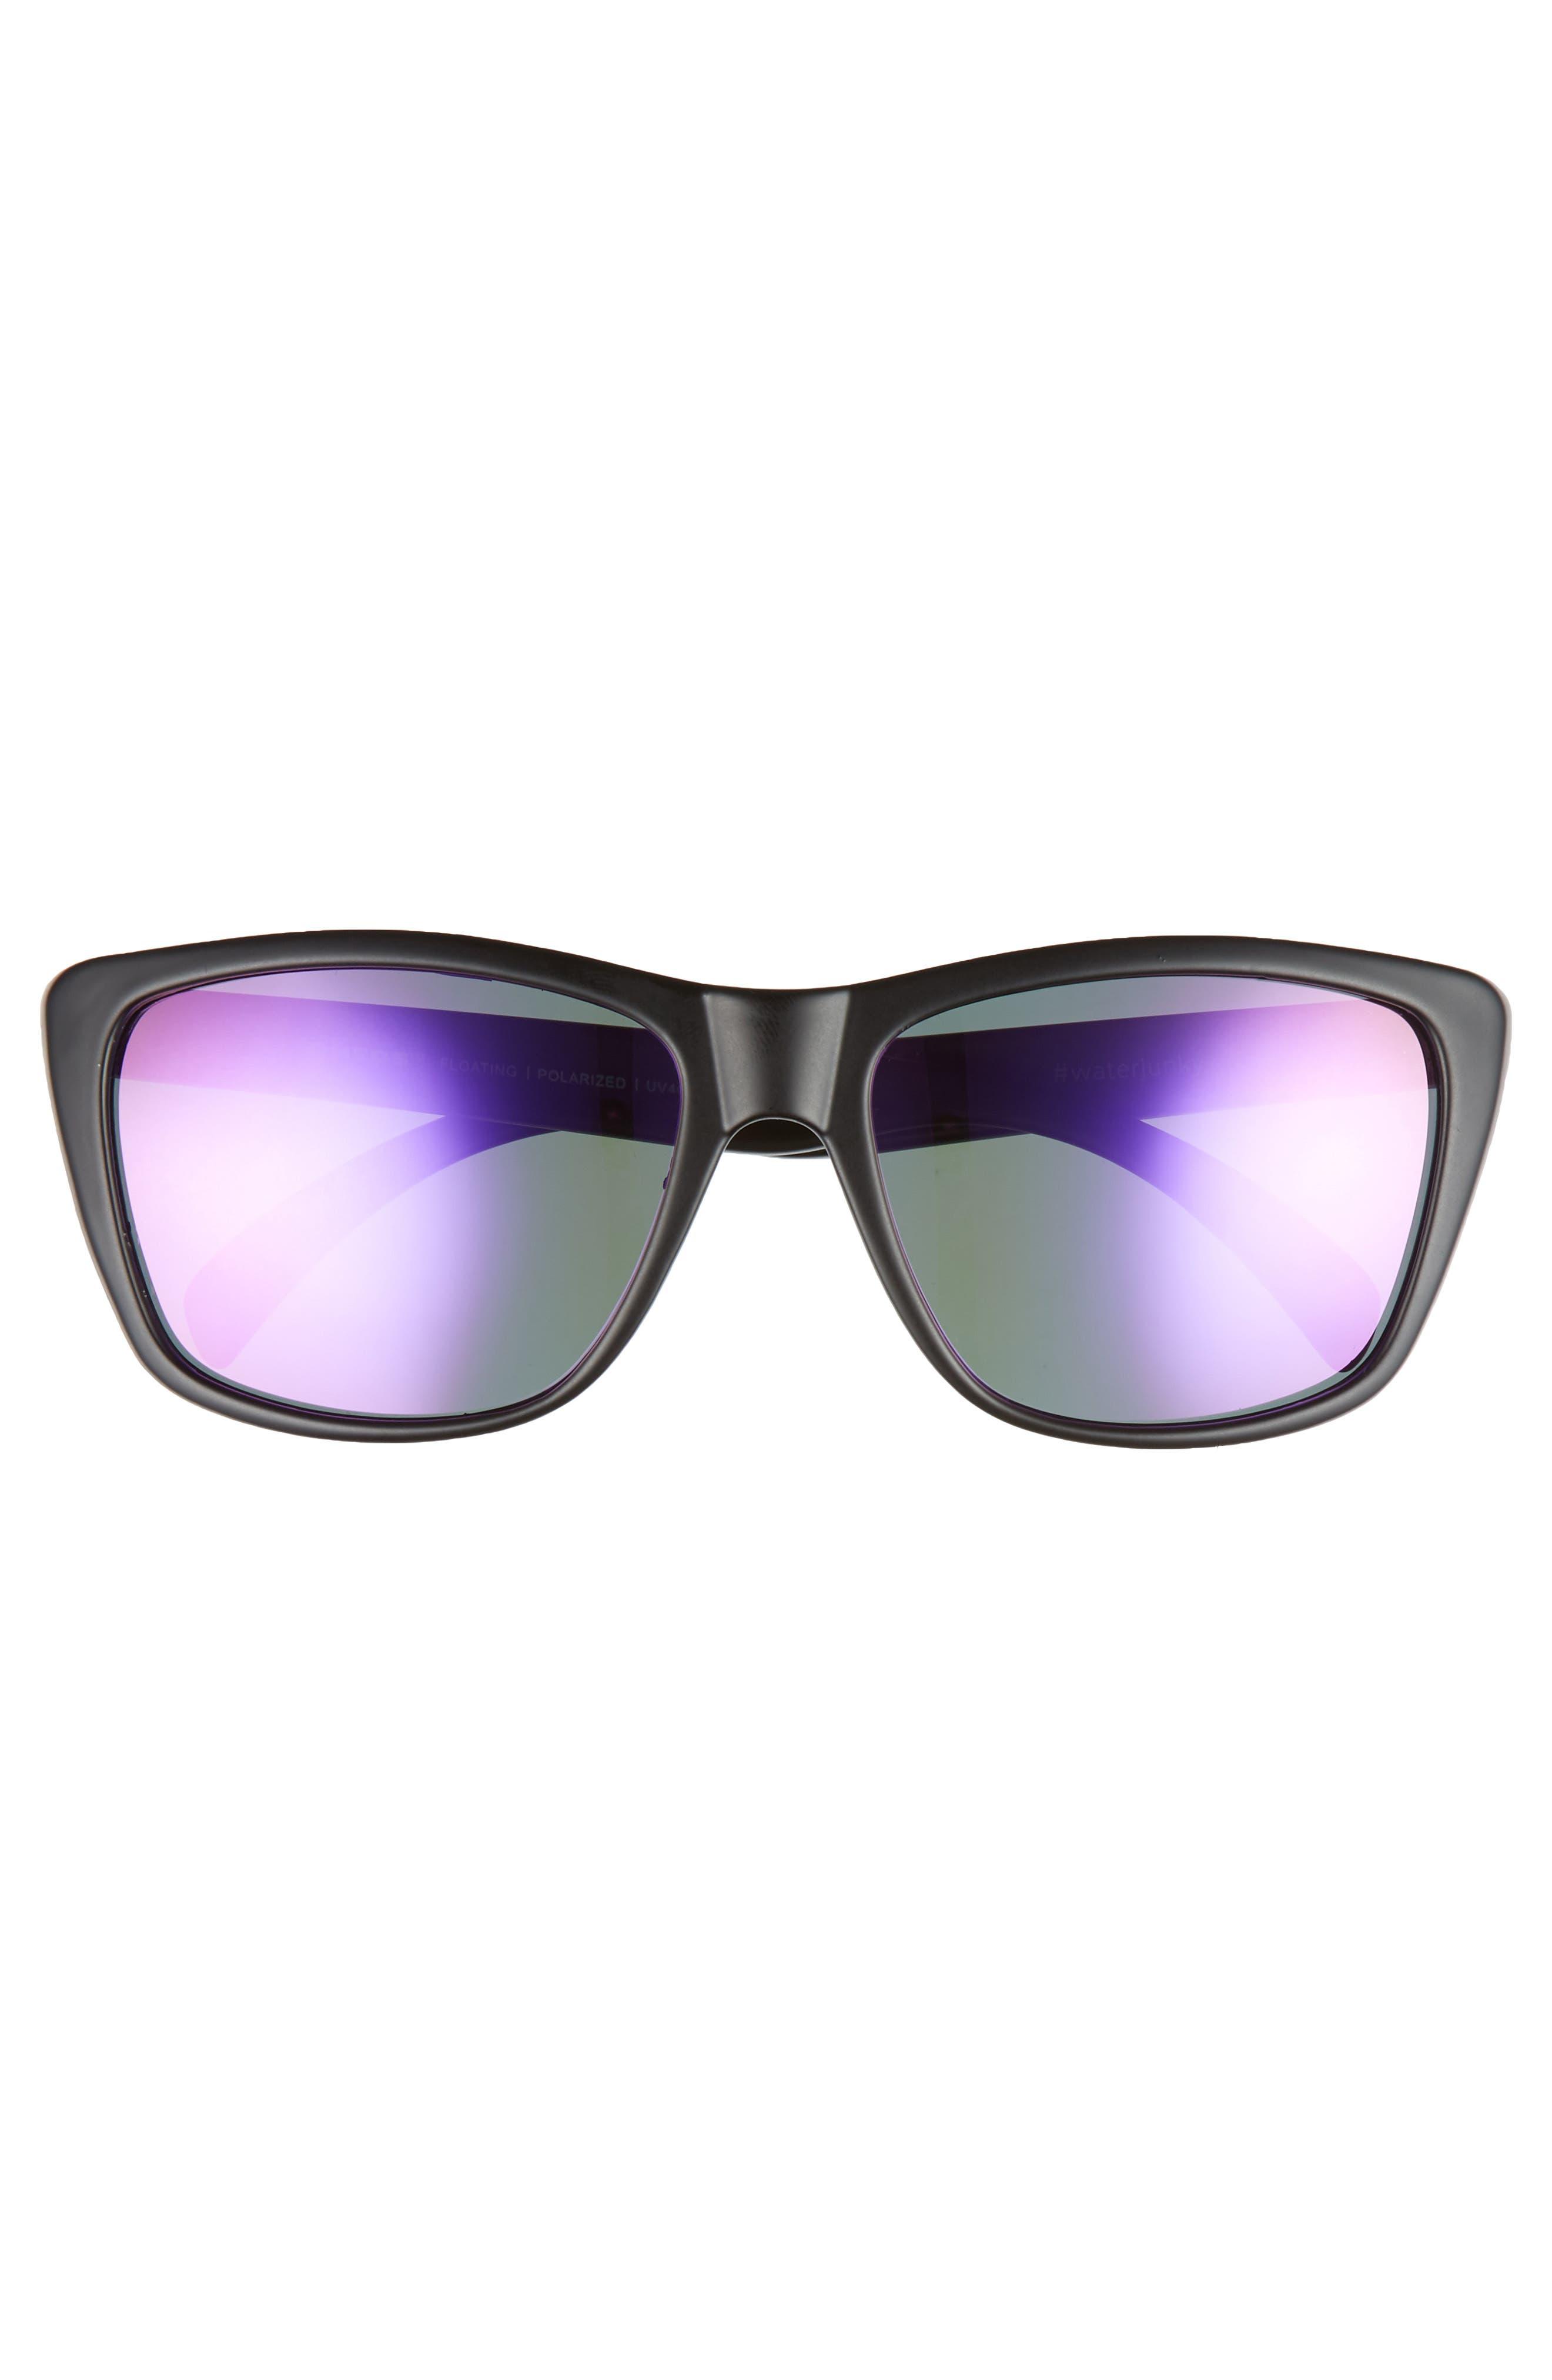 Sapelos Floating 60mm Polarized Sunglasses,                             Alternate thumbnail 2, color,                             GUNMETAL / PURPLE